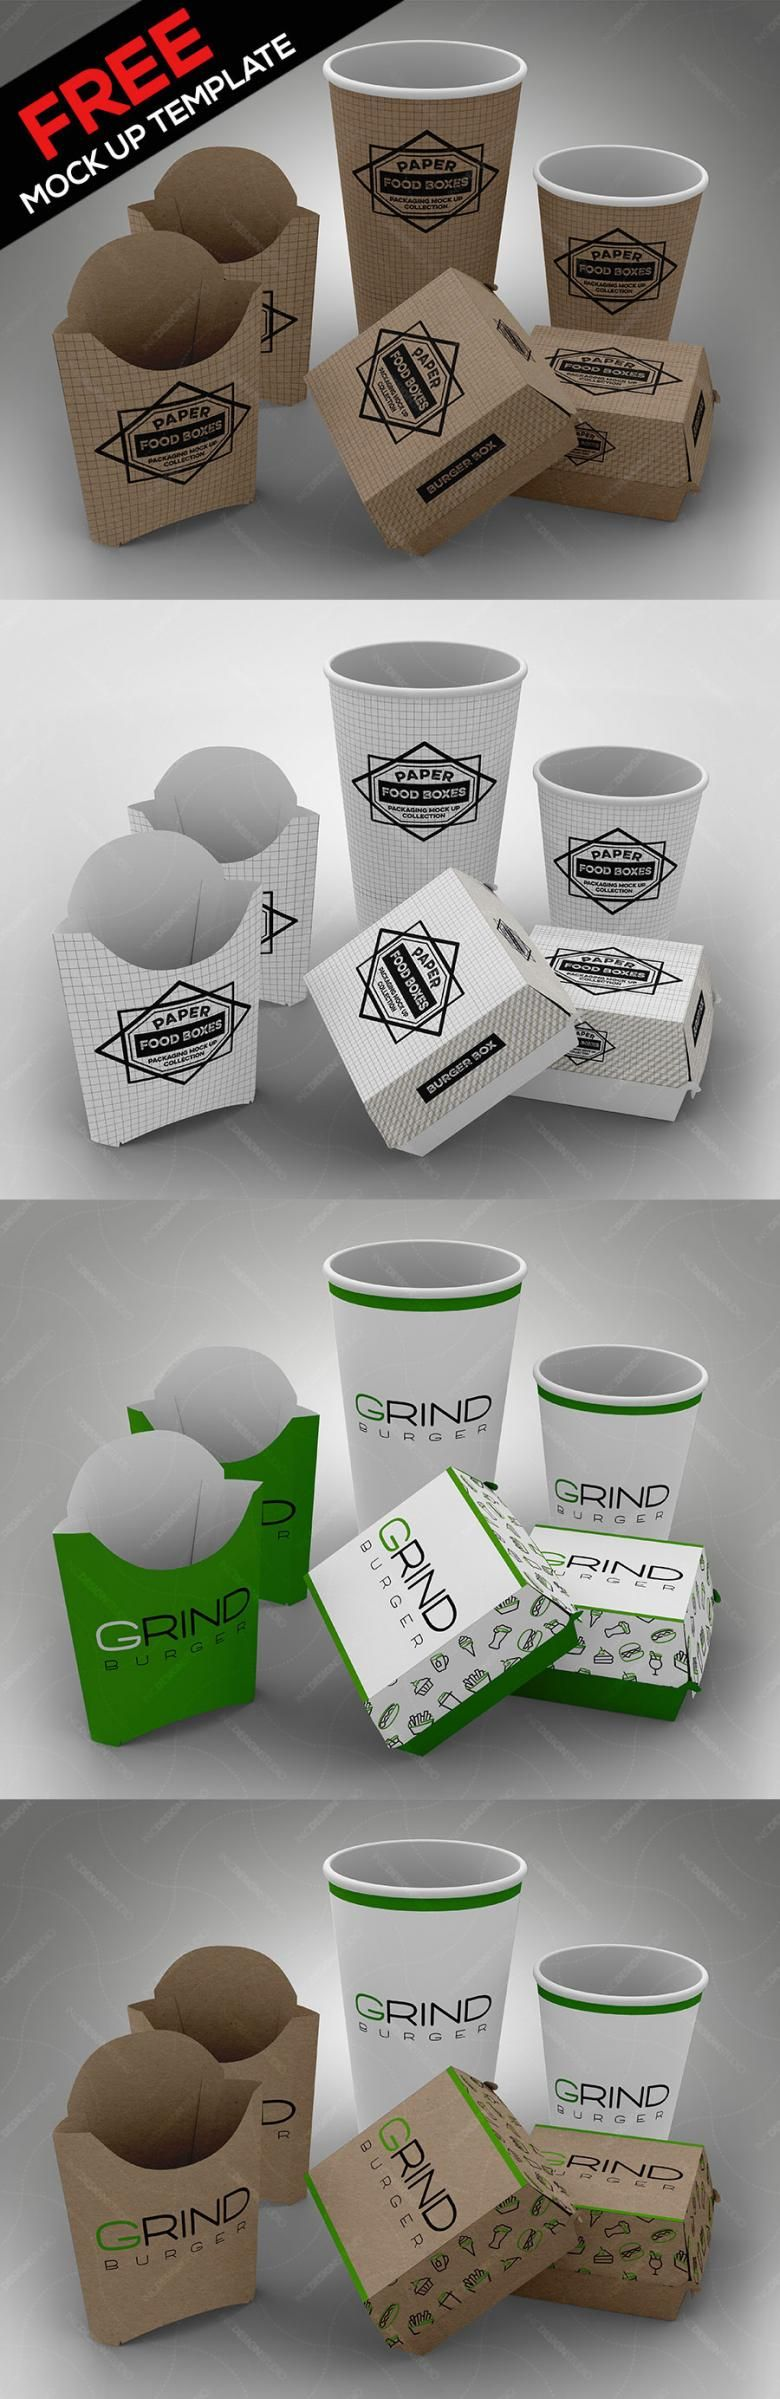 Free Fast Food Packaging Mockup Set Fast Food Packaging Food Packaging Mockup Food Packaging